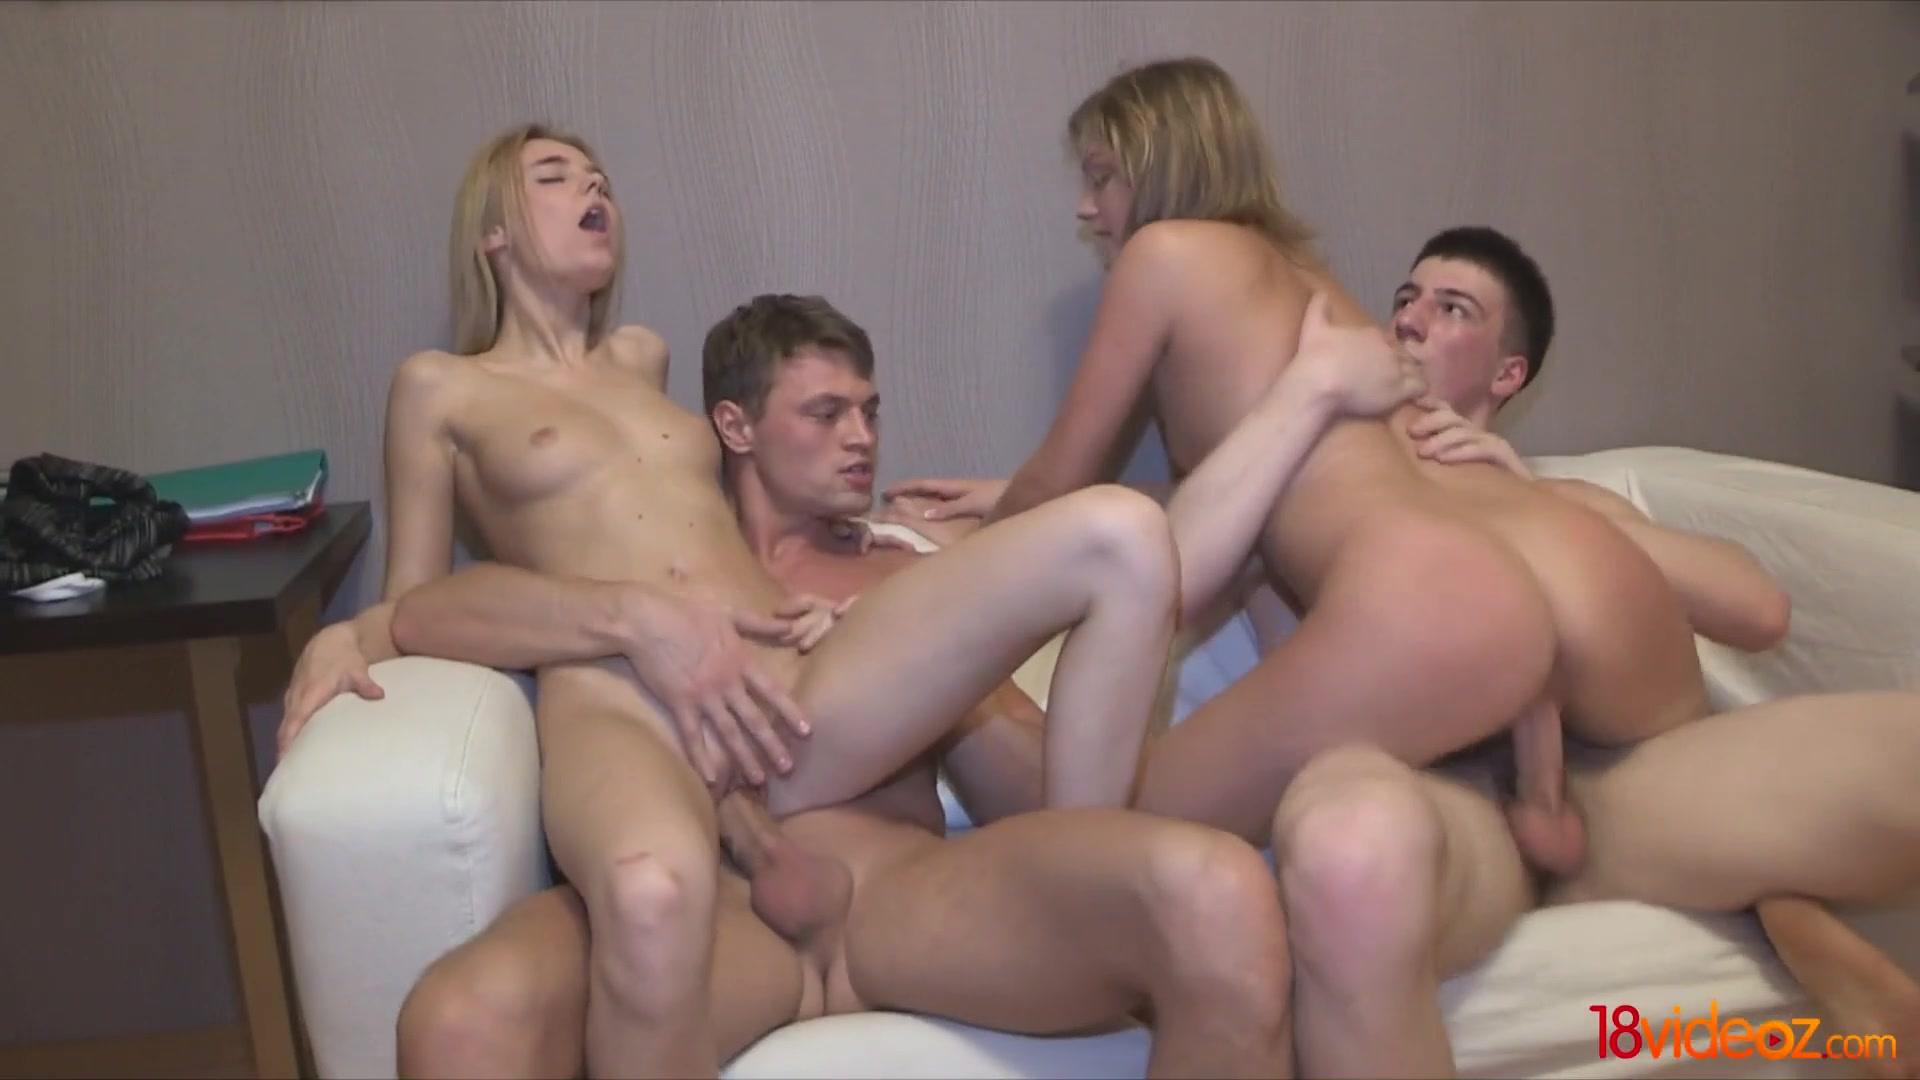 smotret-besplatno-video-porno-russkih-studentok-novinki